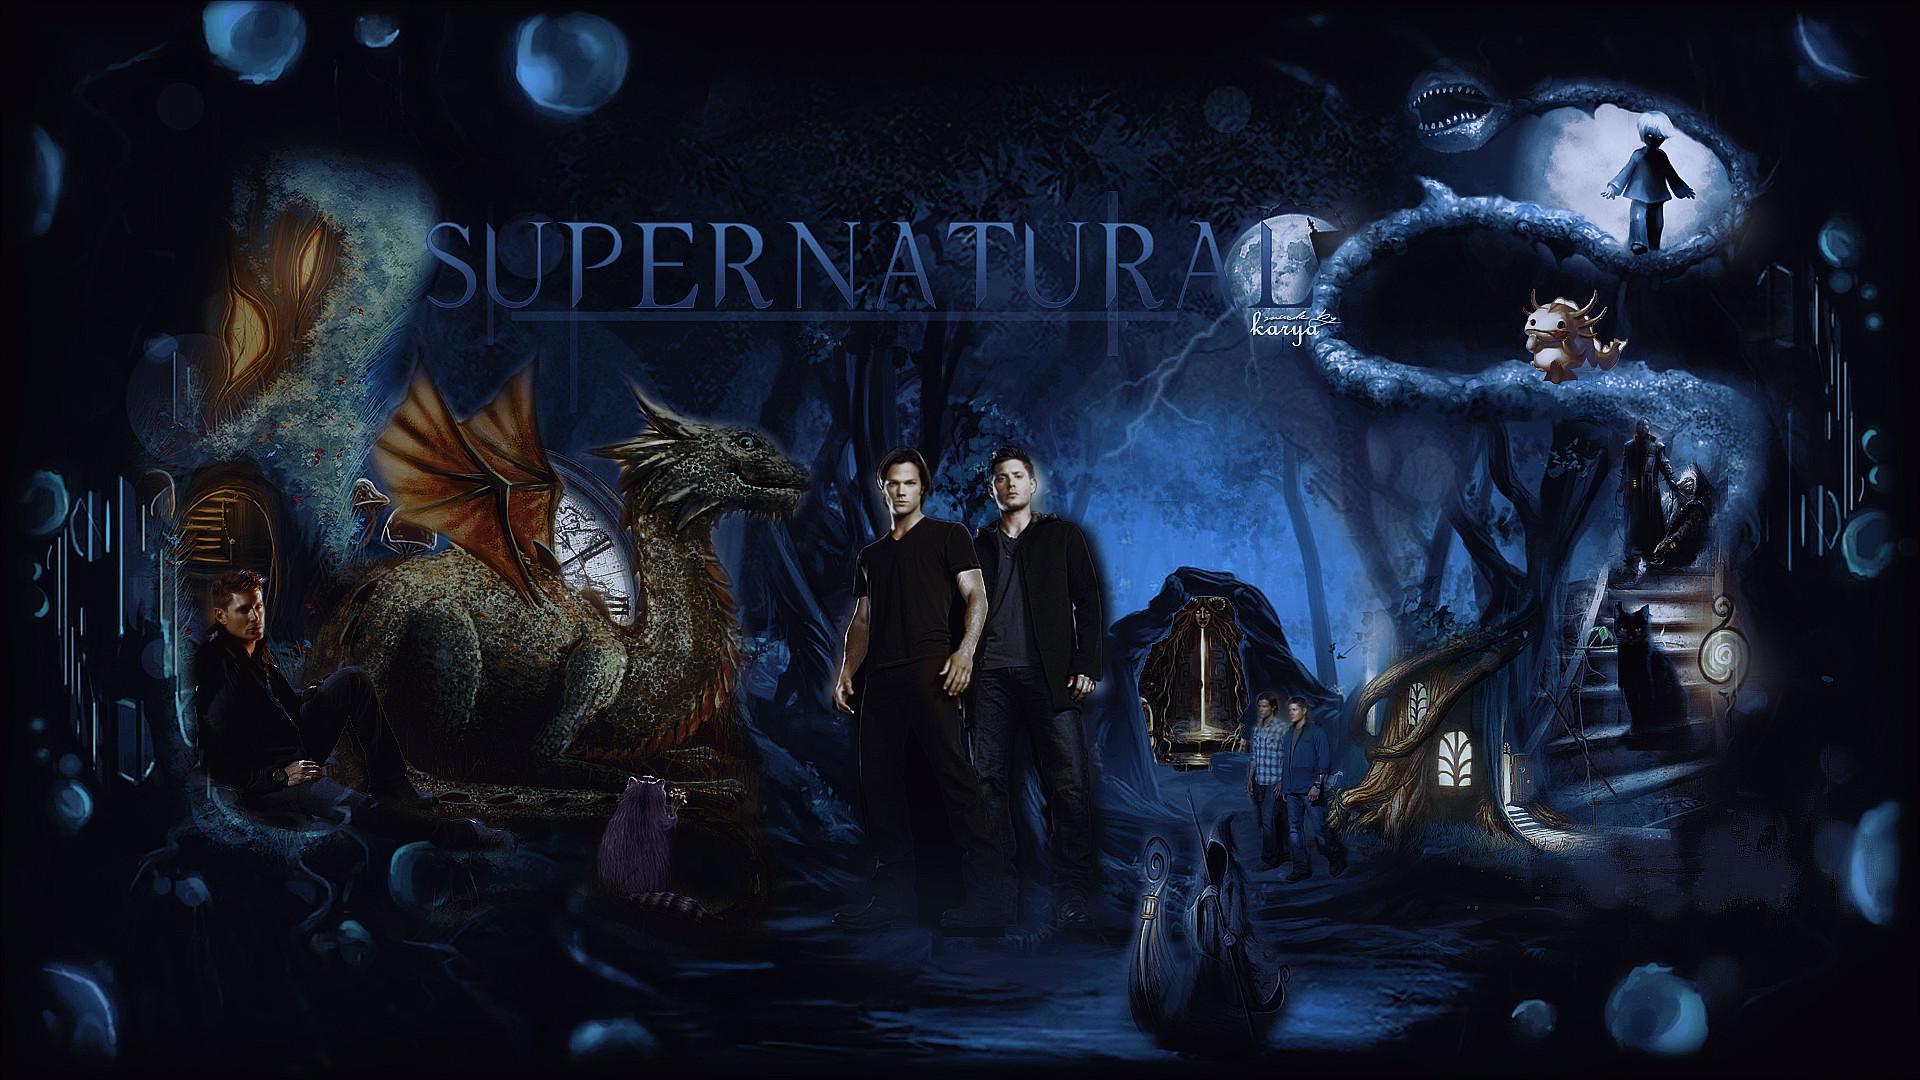 0 Supernatural Wallpapers 2015 Supernatural Wallpapers 2016